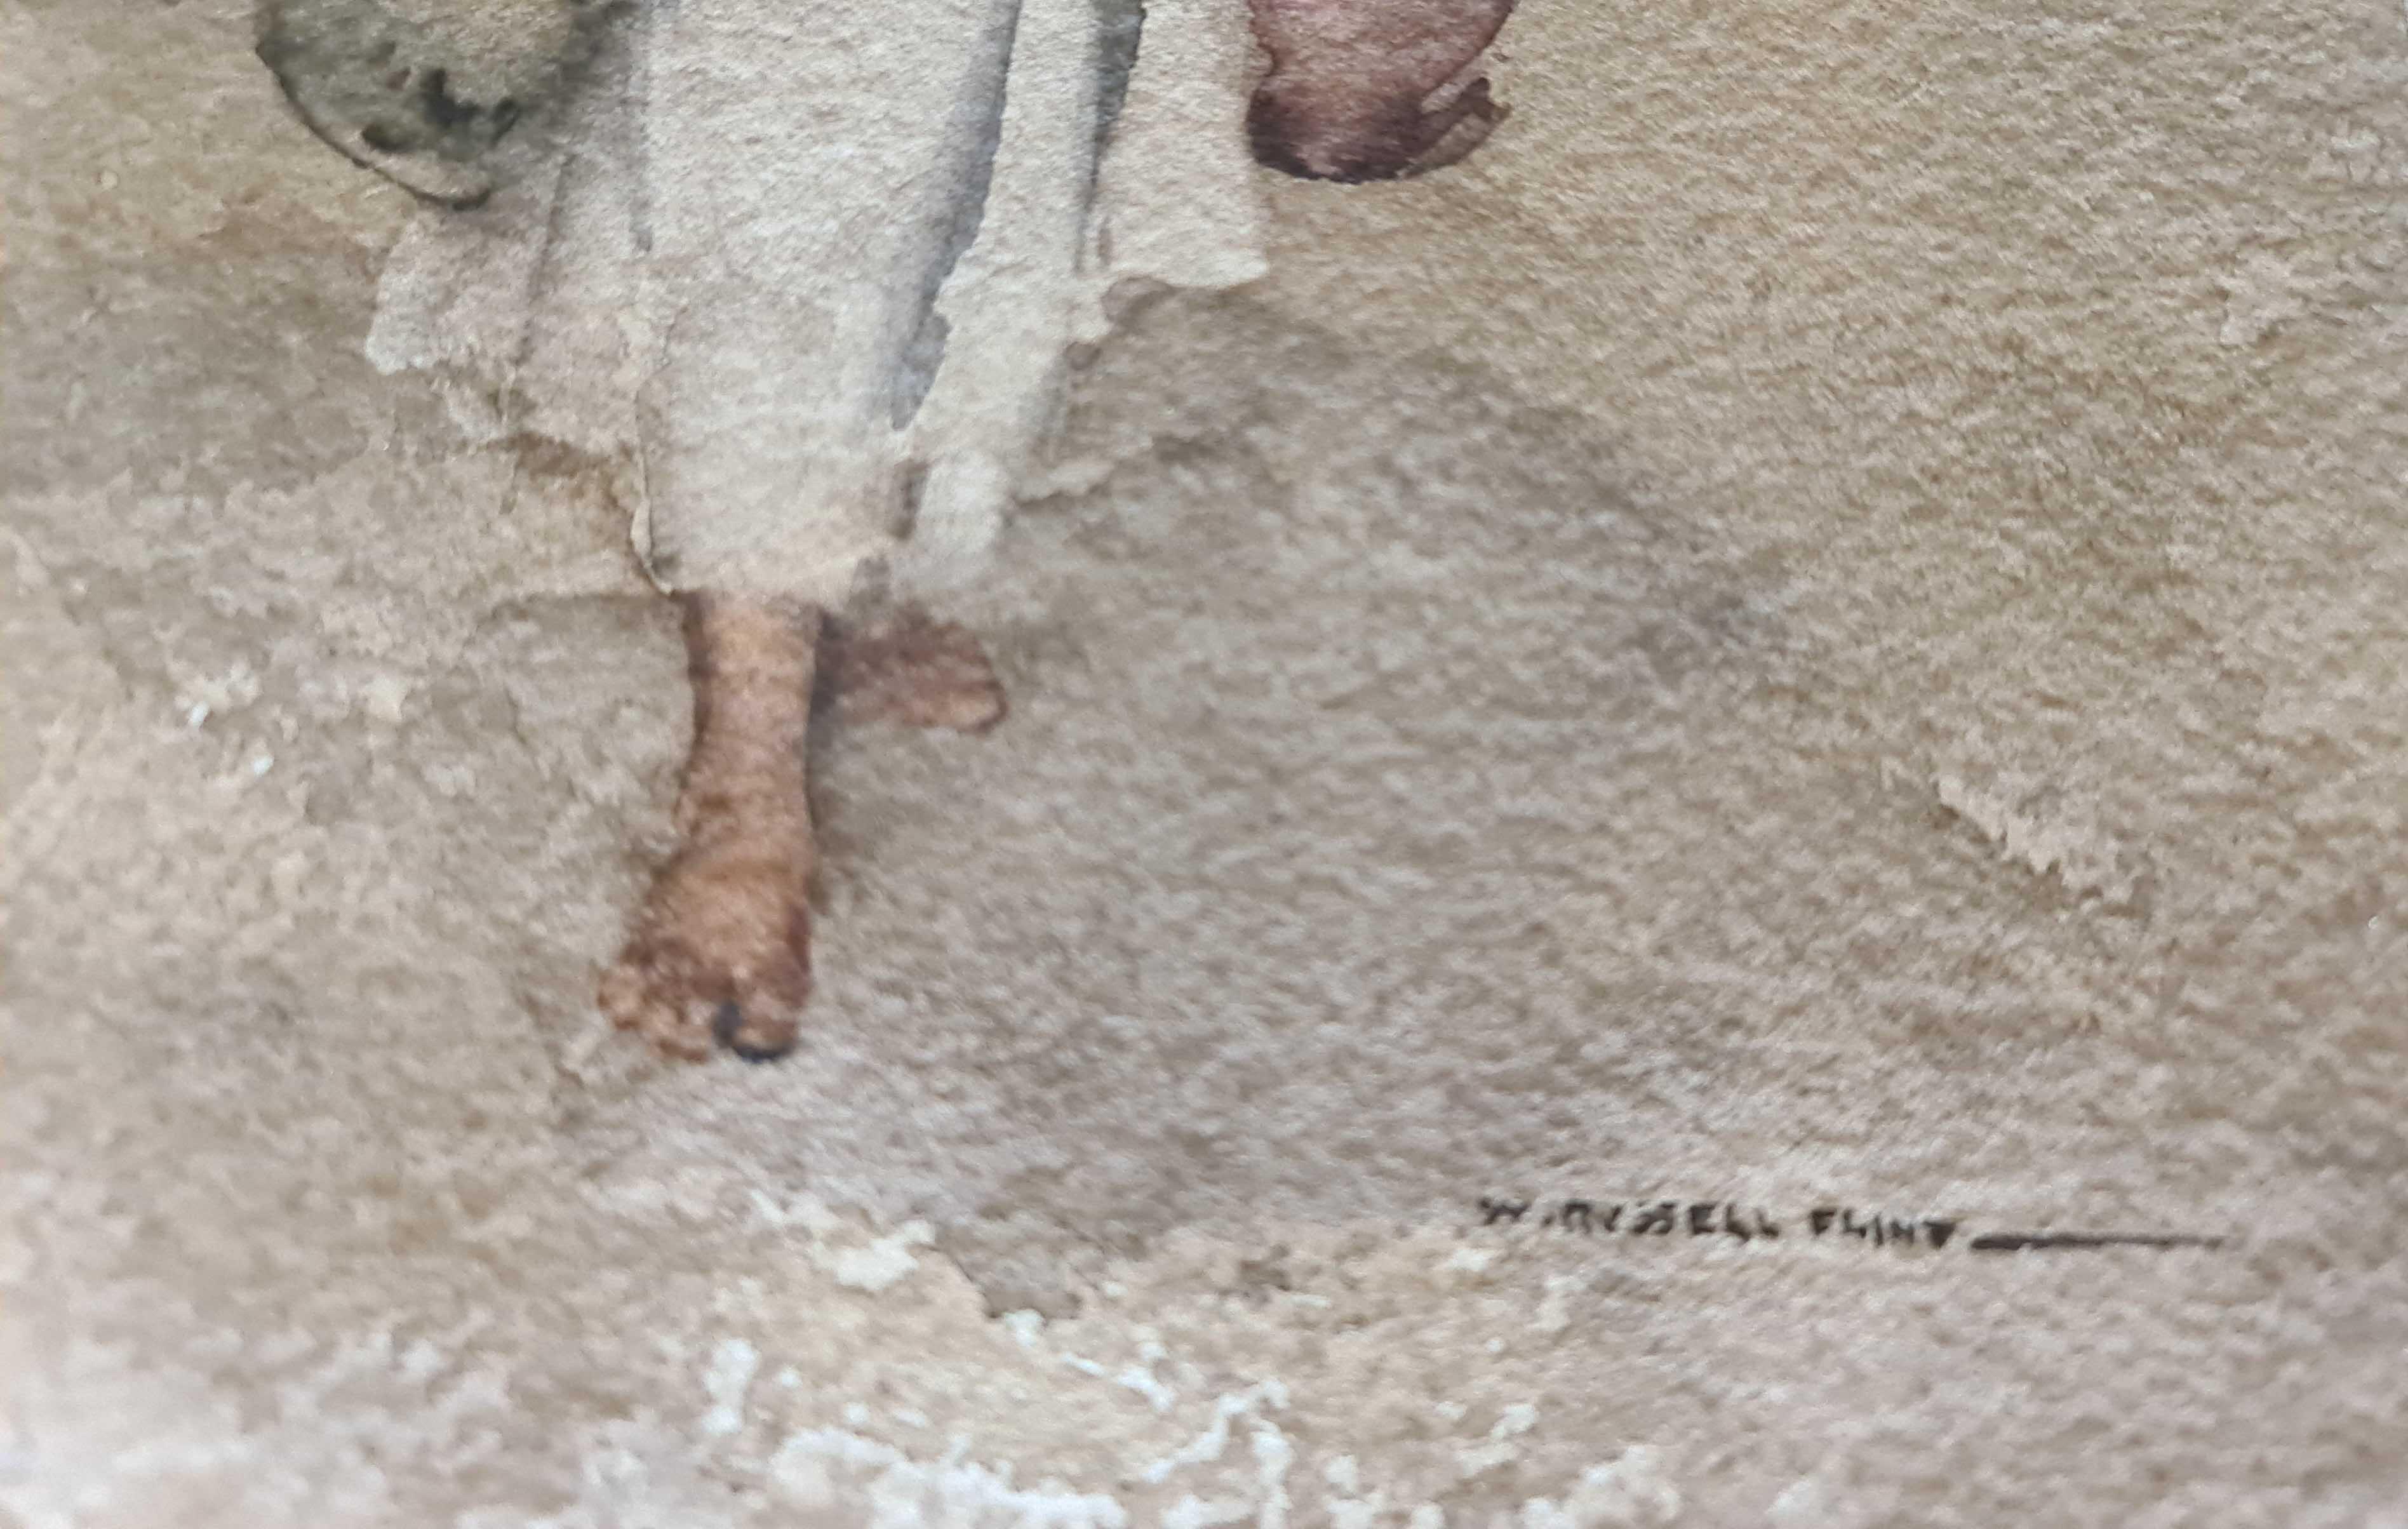 russell flint, original painting,Rebecca at Aigueze, France, signature